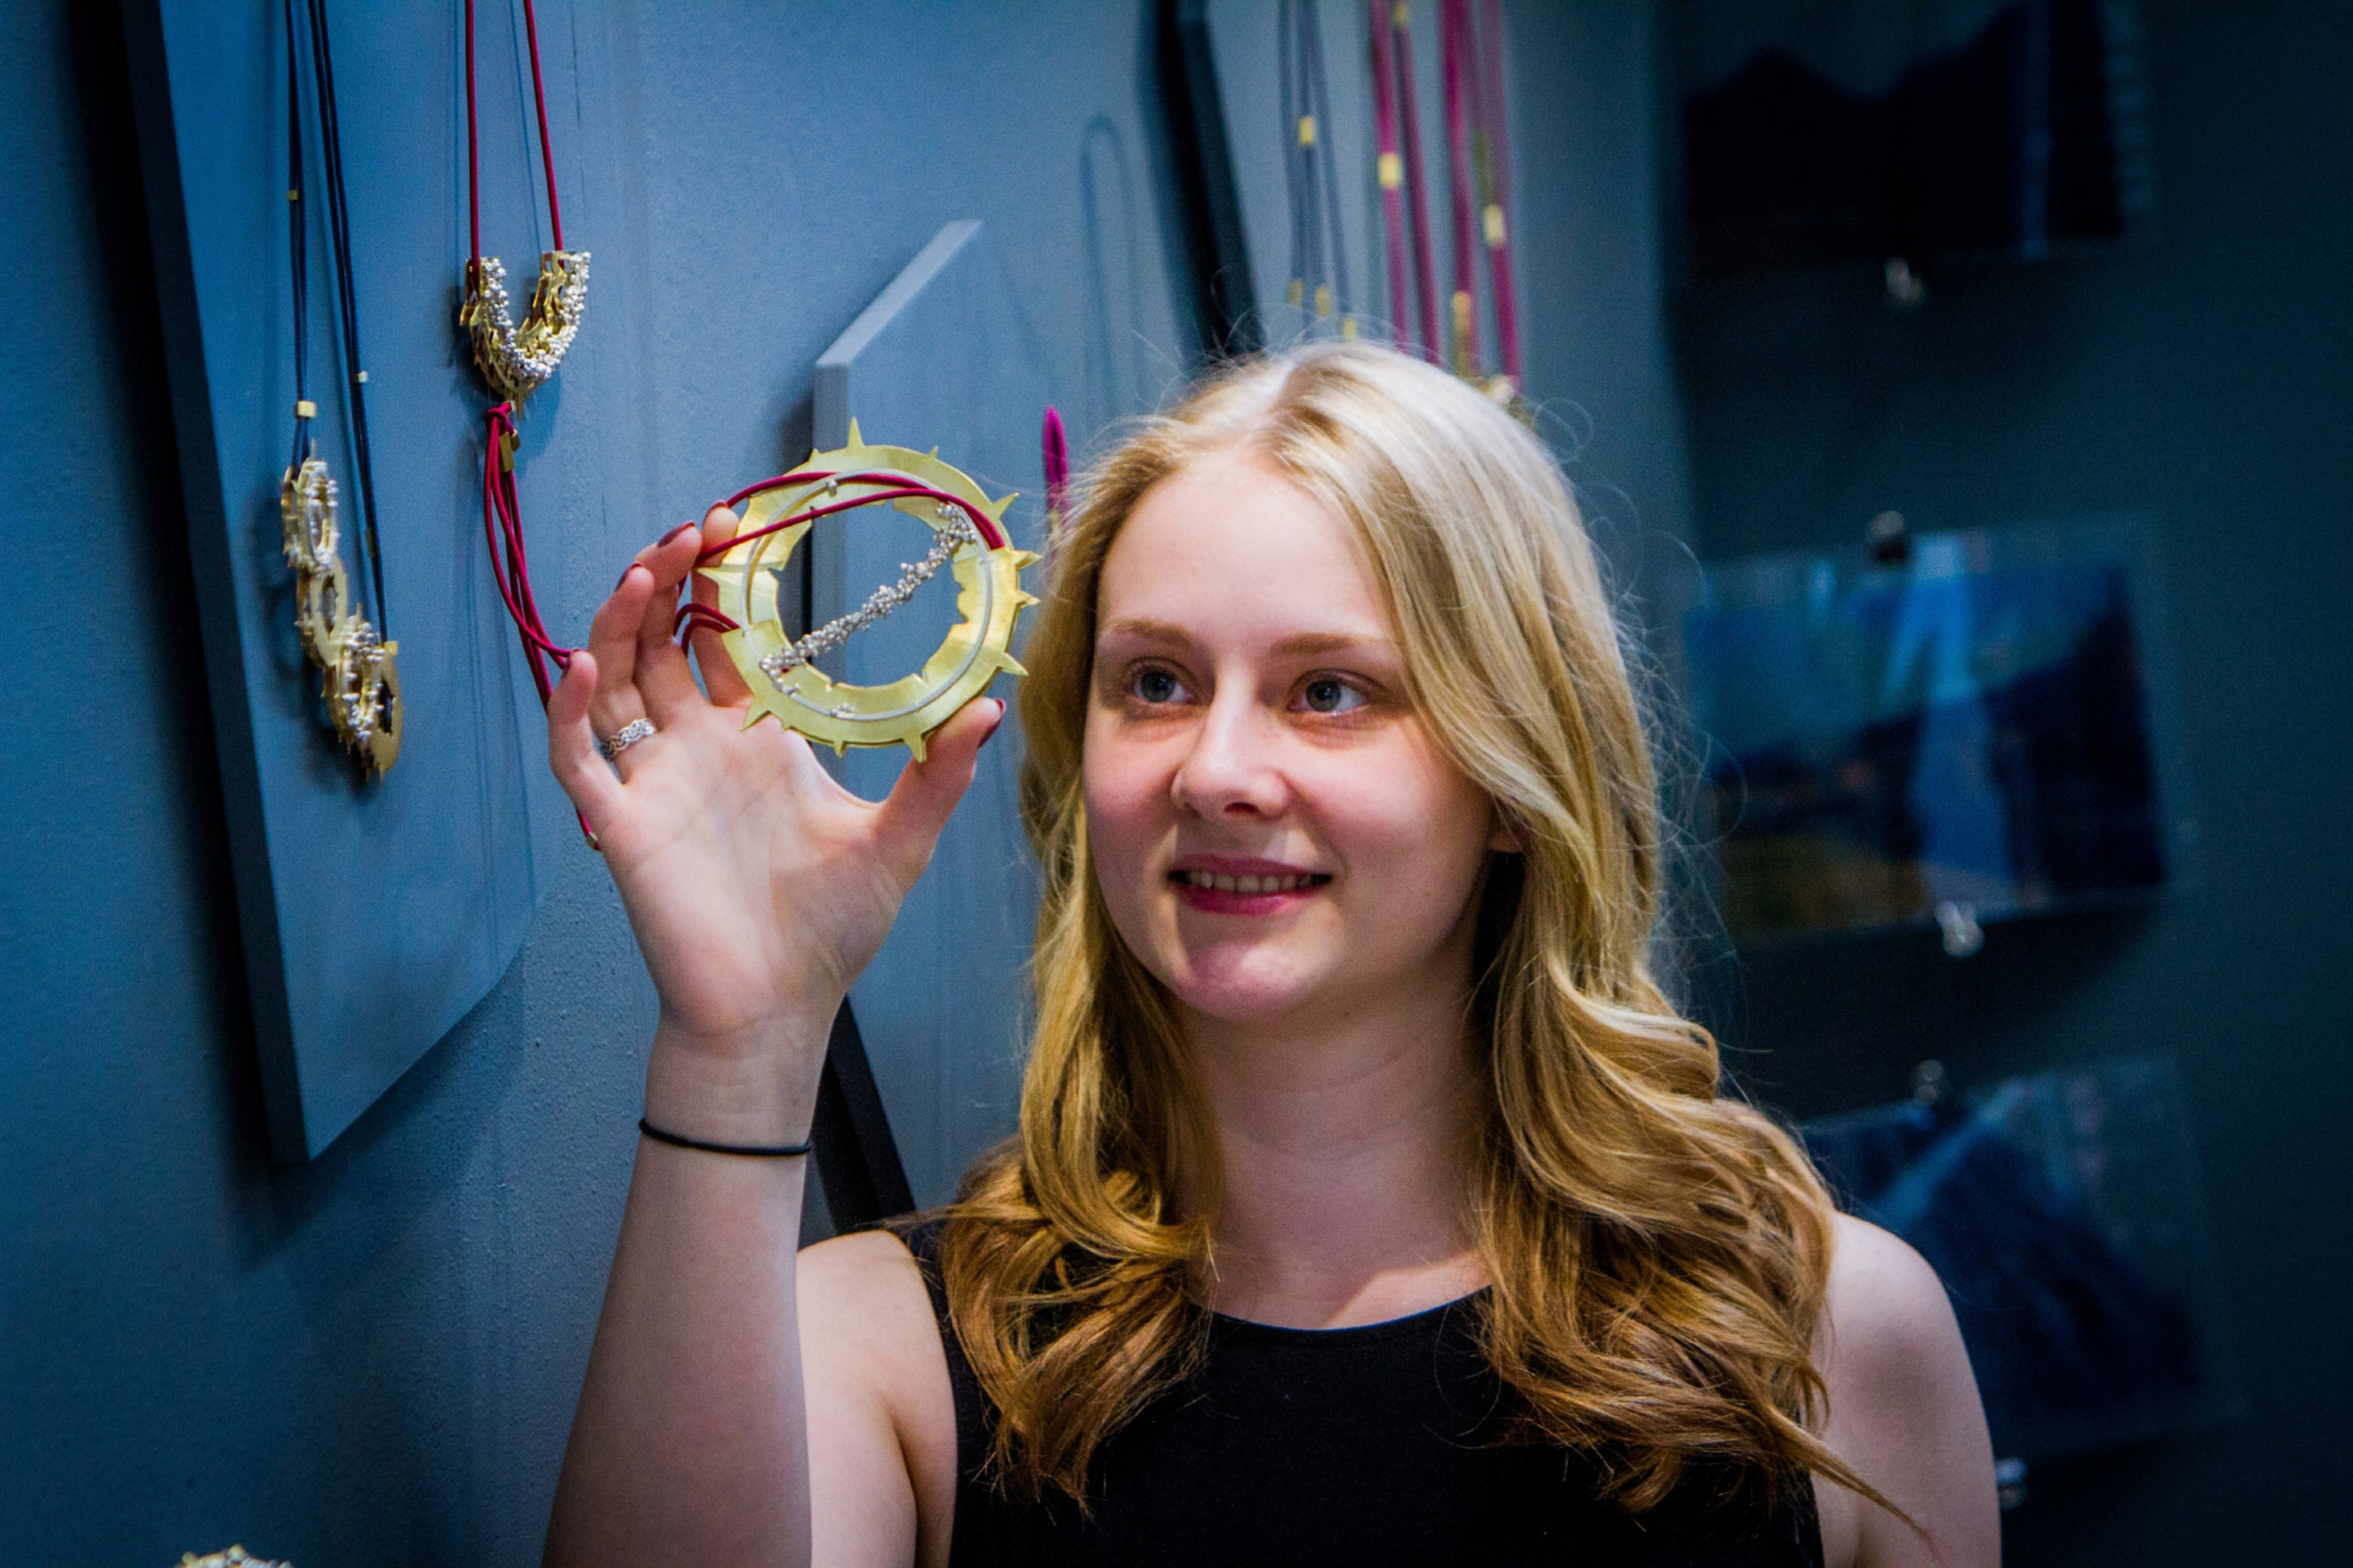 Aimee Cargill, 21, with her jewellery work.